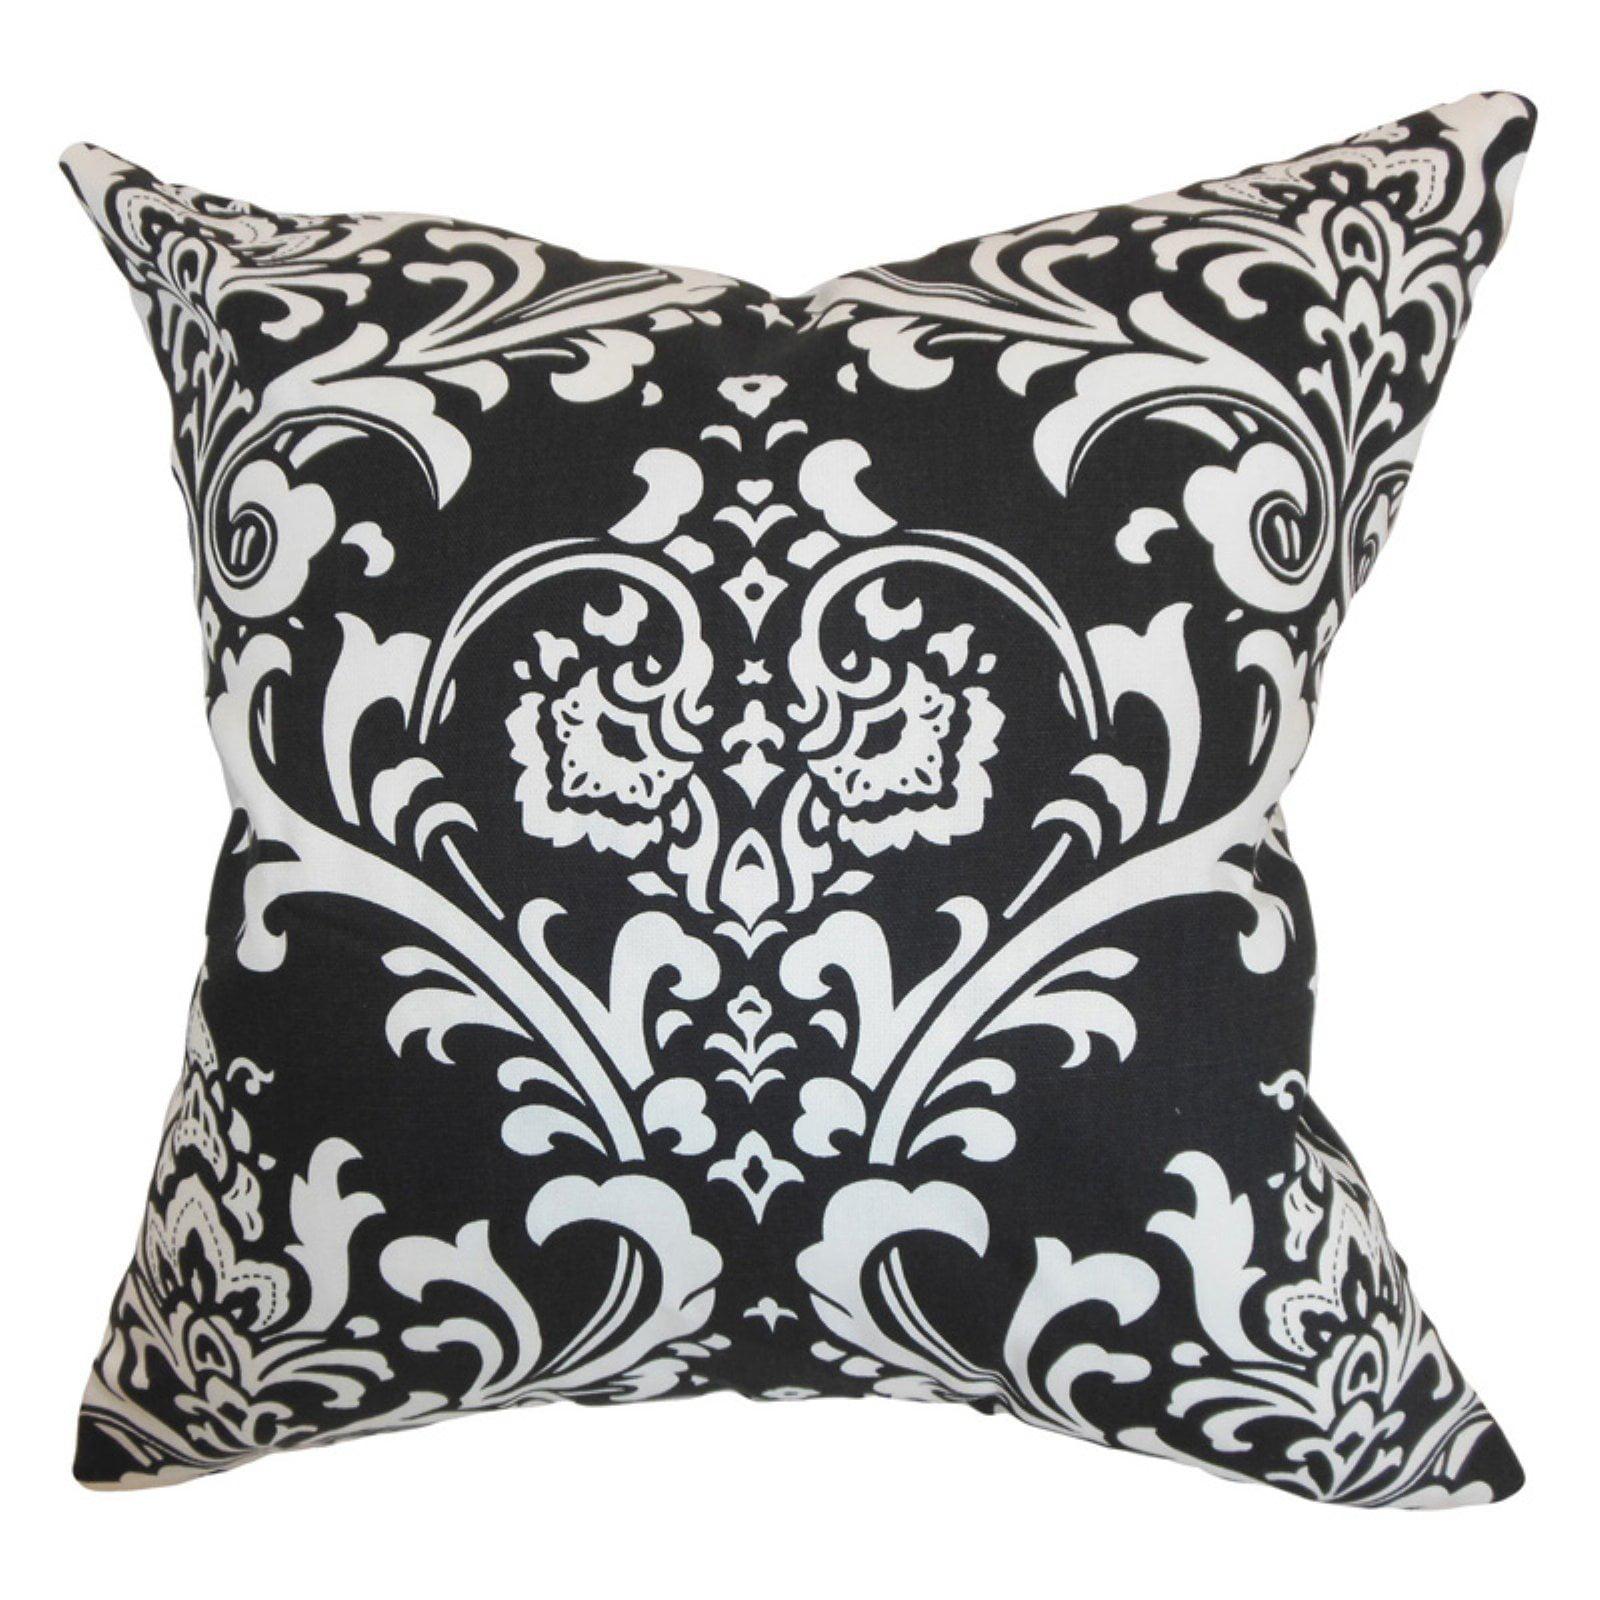 The Pillow Collection Malaga Damask Pillow